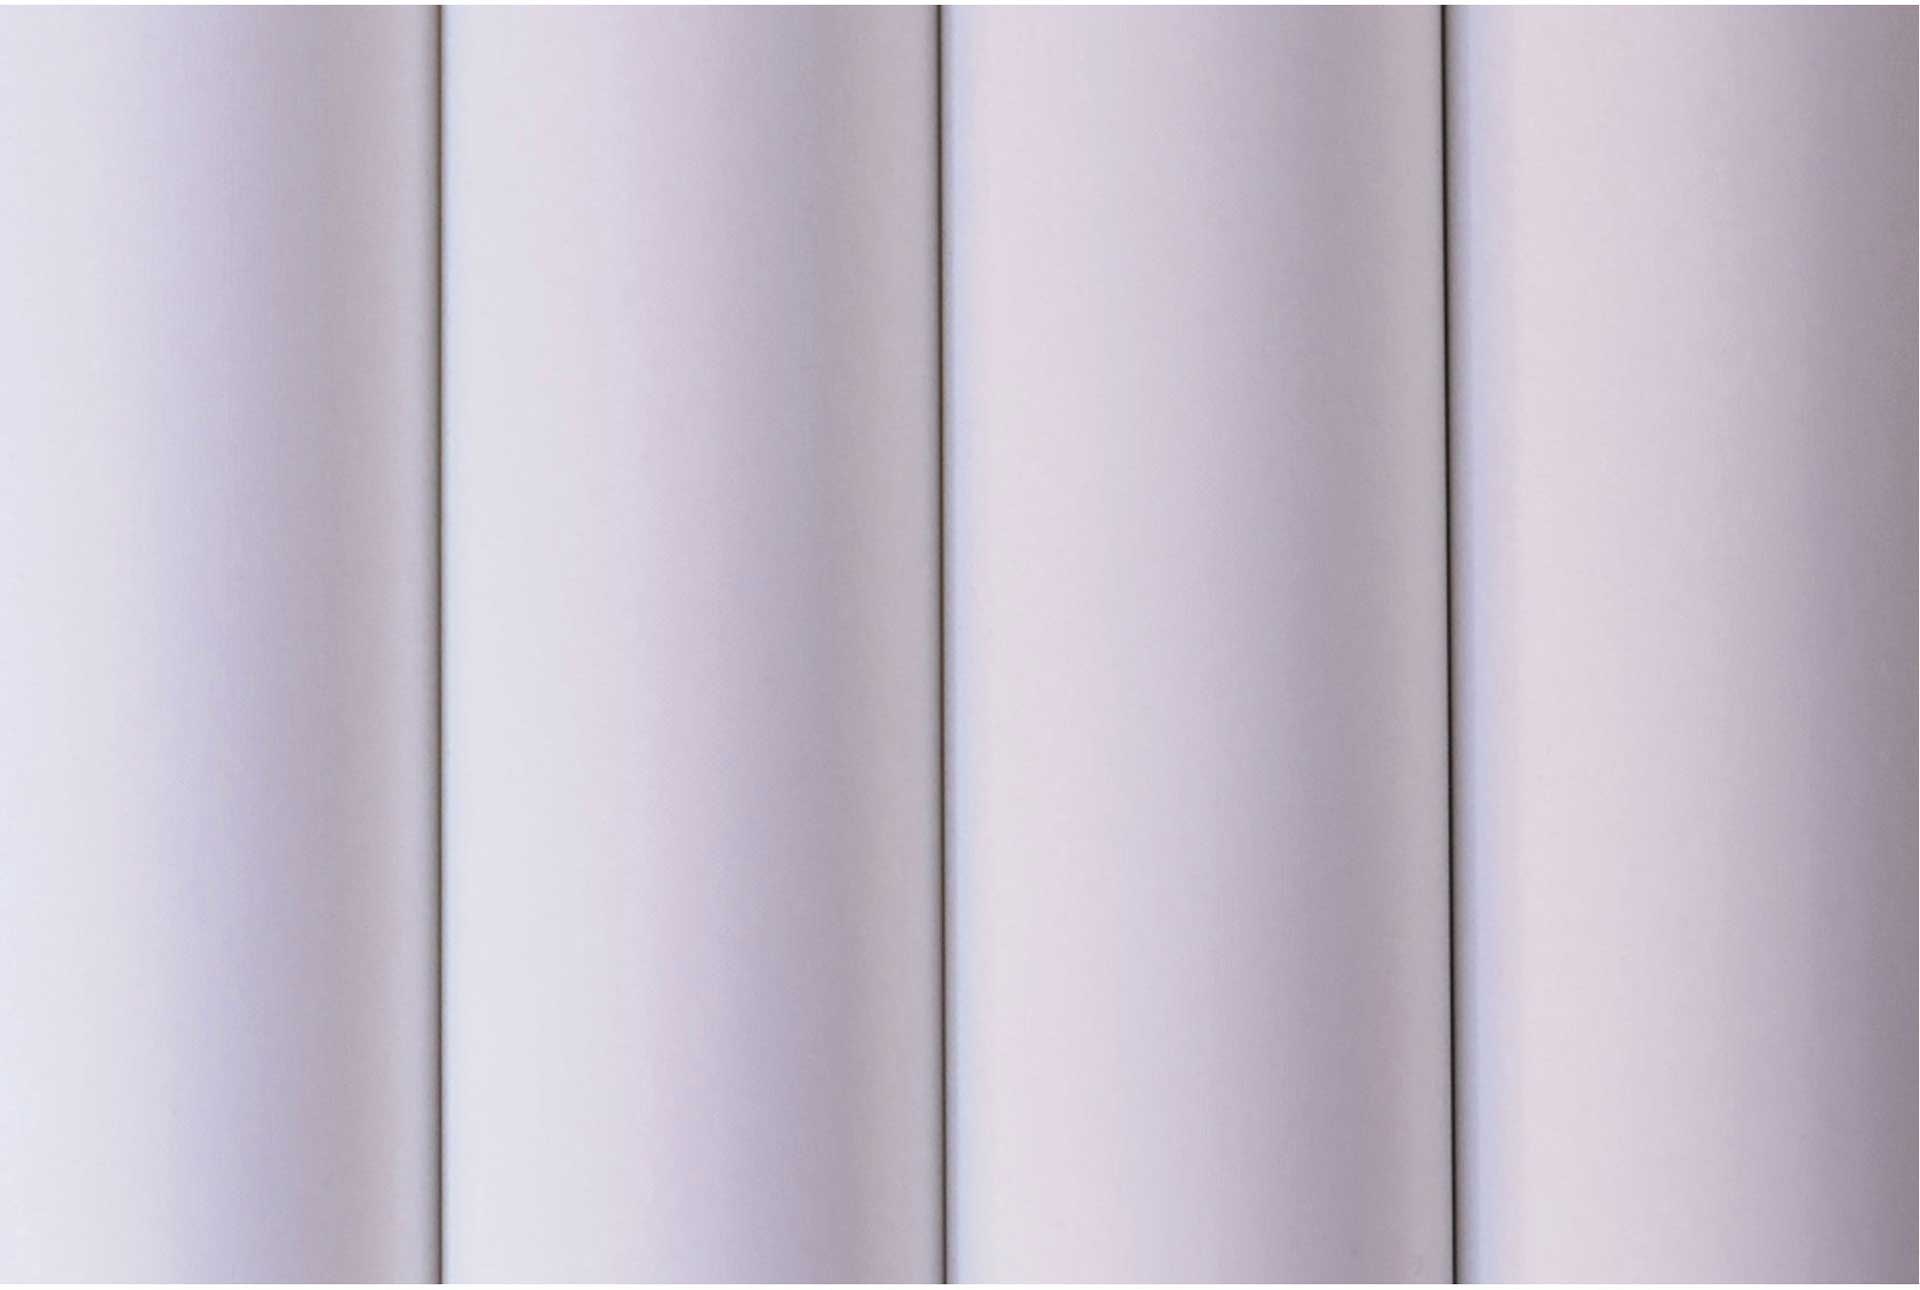 Oracover Paintingfabric 2 metre # 01